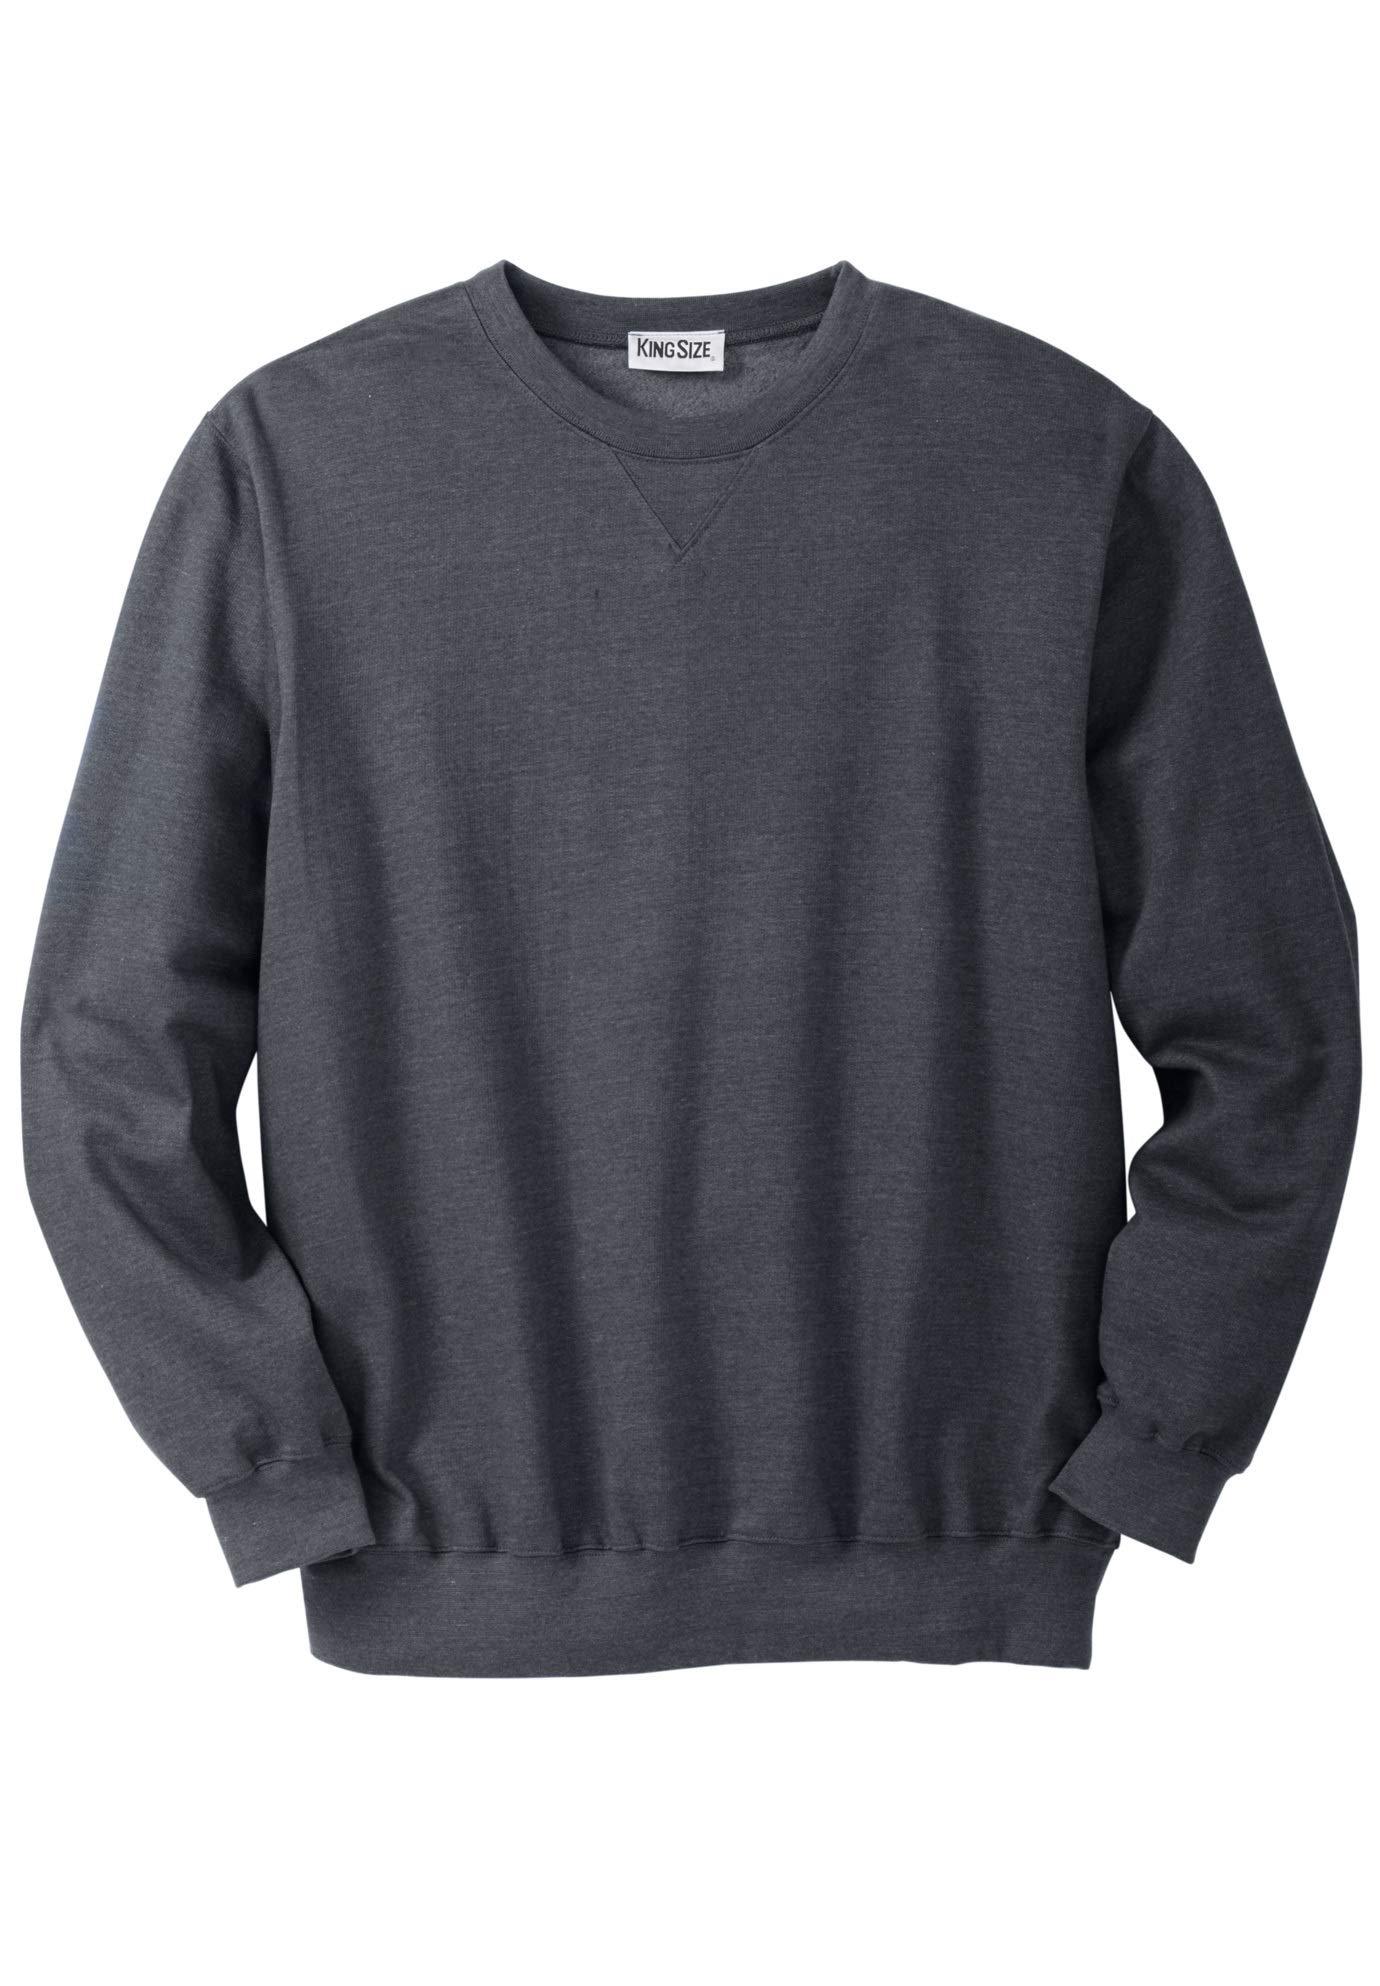 KingSize Men's Big & Tall Fleece Crewneck Sweatshirt, Heather Charcoal Big-3XL